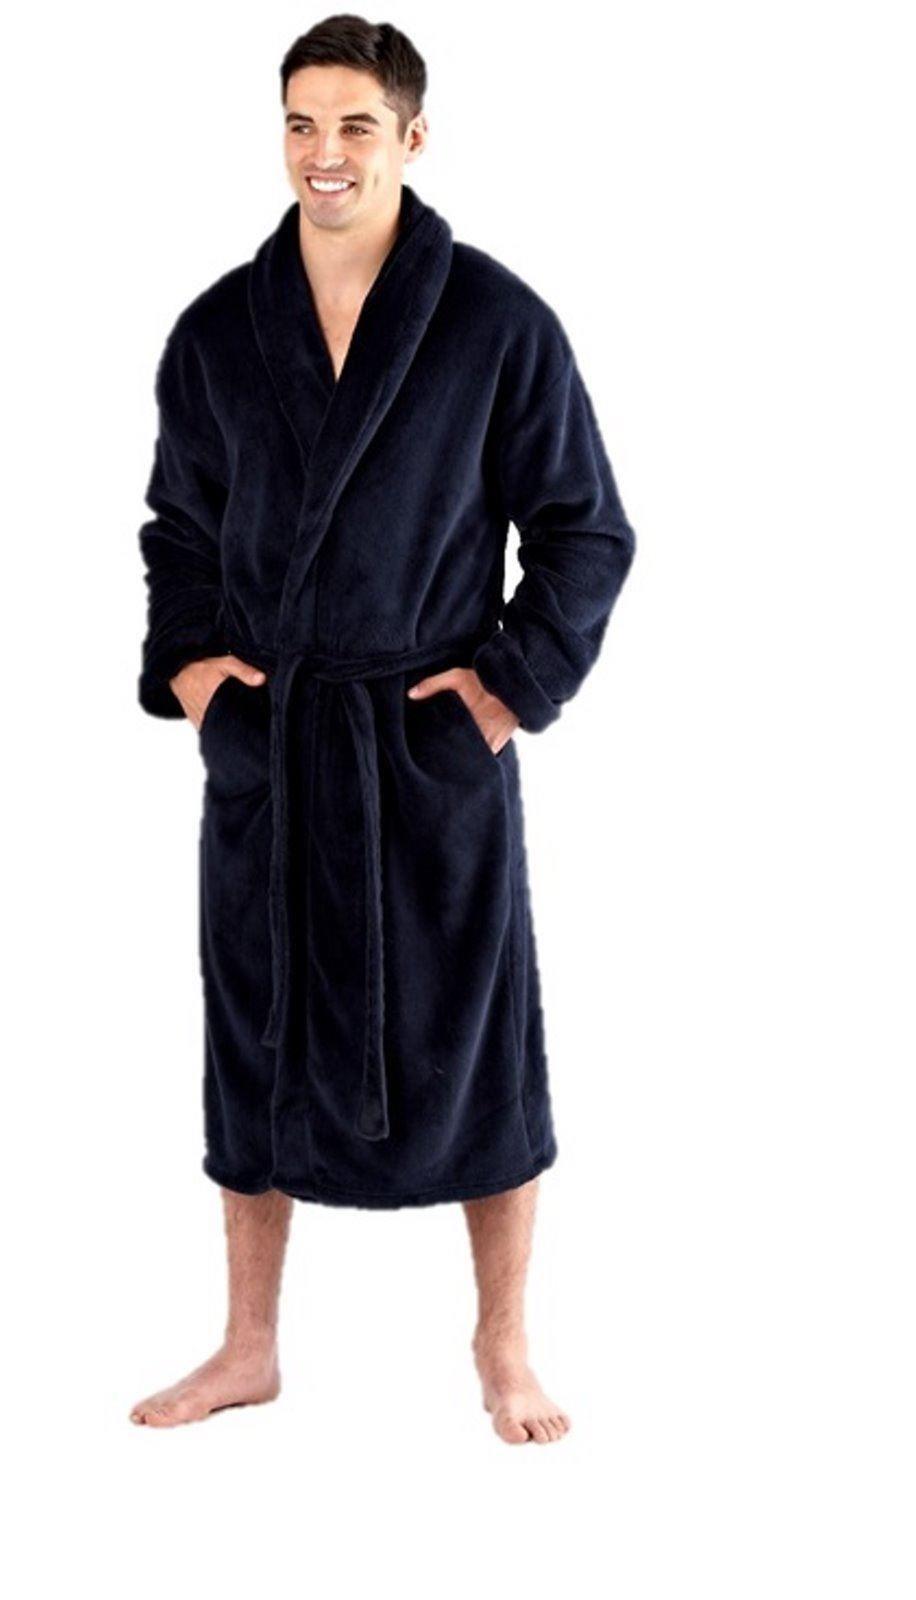 mens fleece dressing gown bath robe wrap black navy m l xl xxl ebay